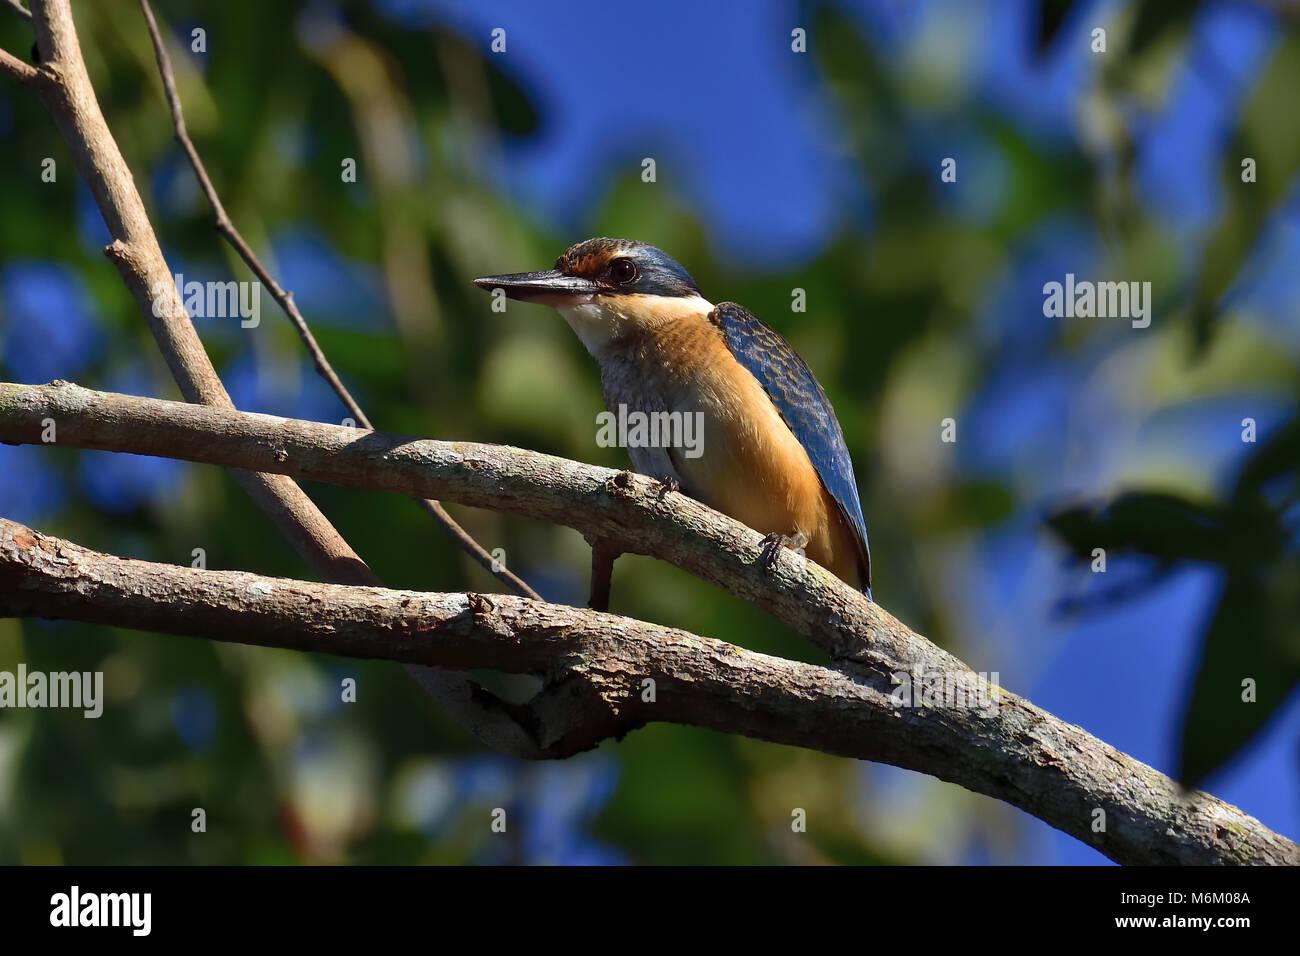 kingfisher catholic single men Video: kingfisher plant explosion 0 share  video: tulsa man sentenced to  life video:  video: man shot and killed by video: locust.